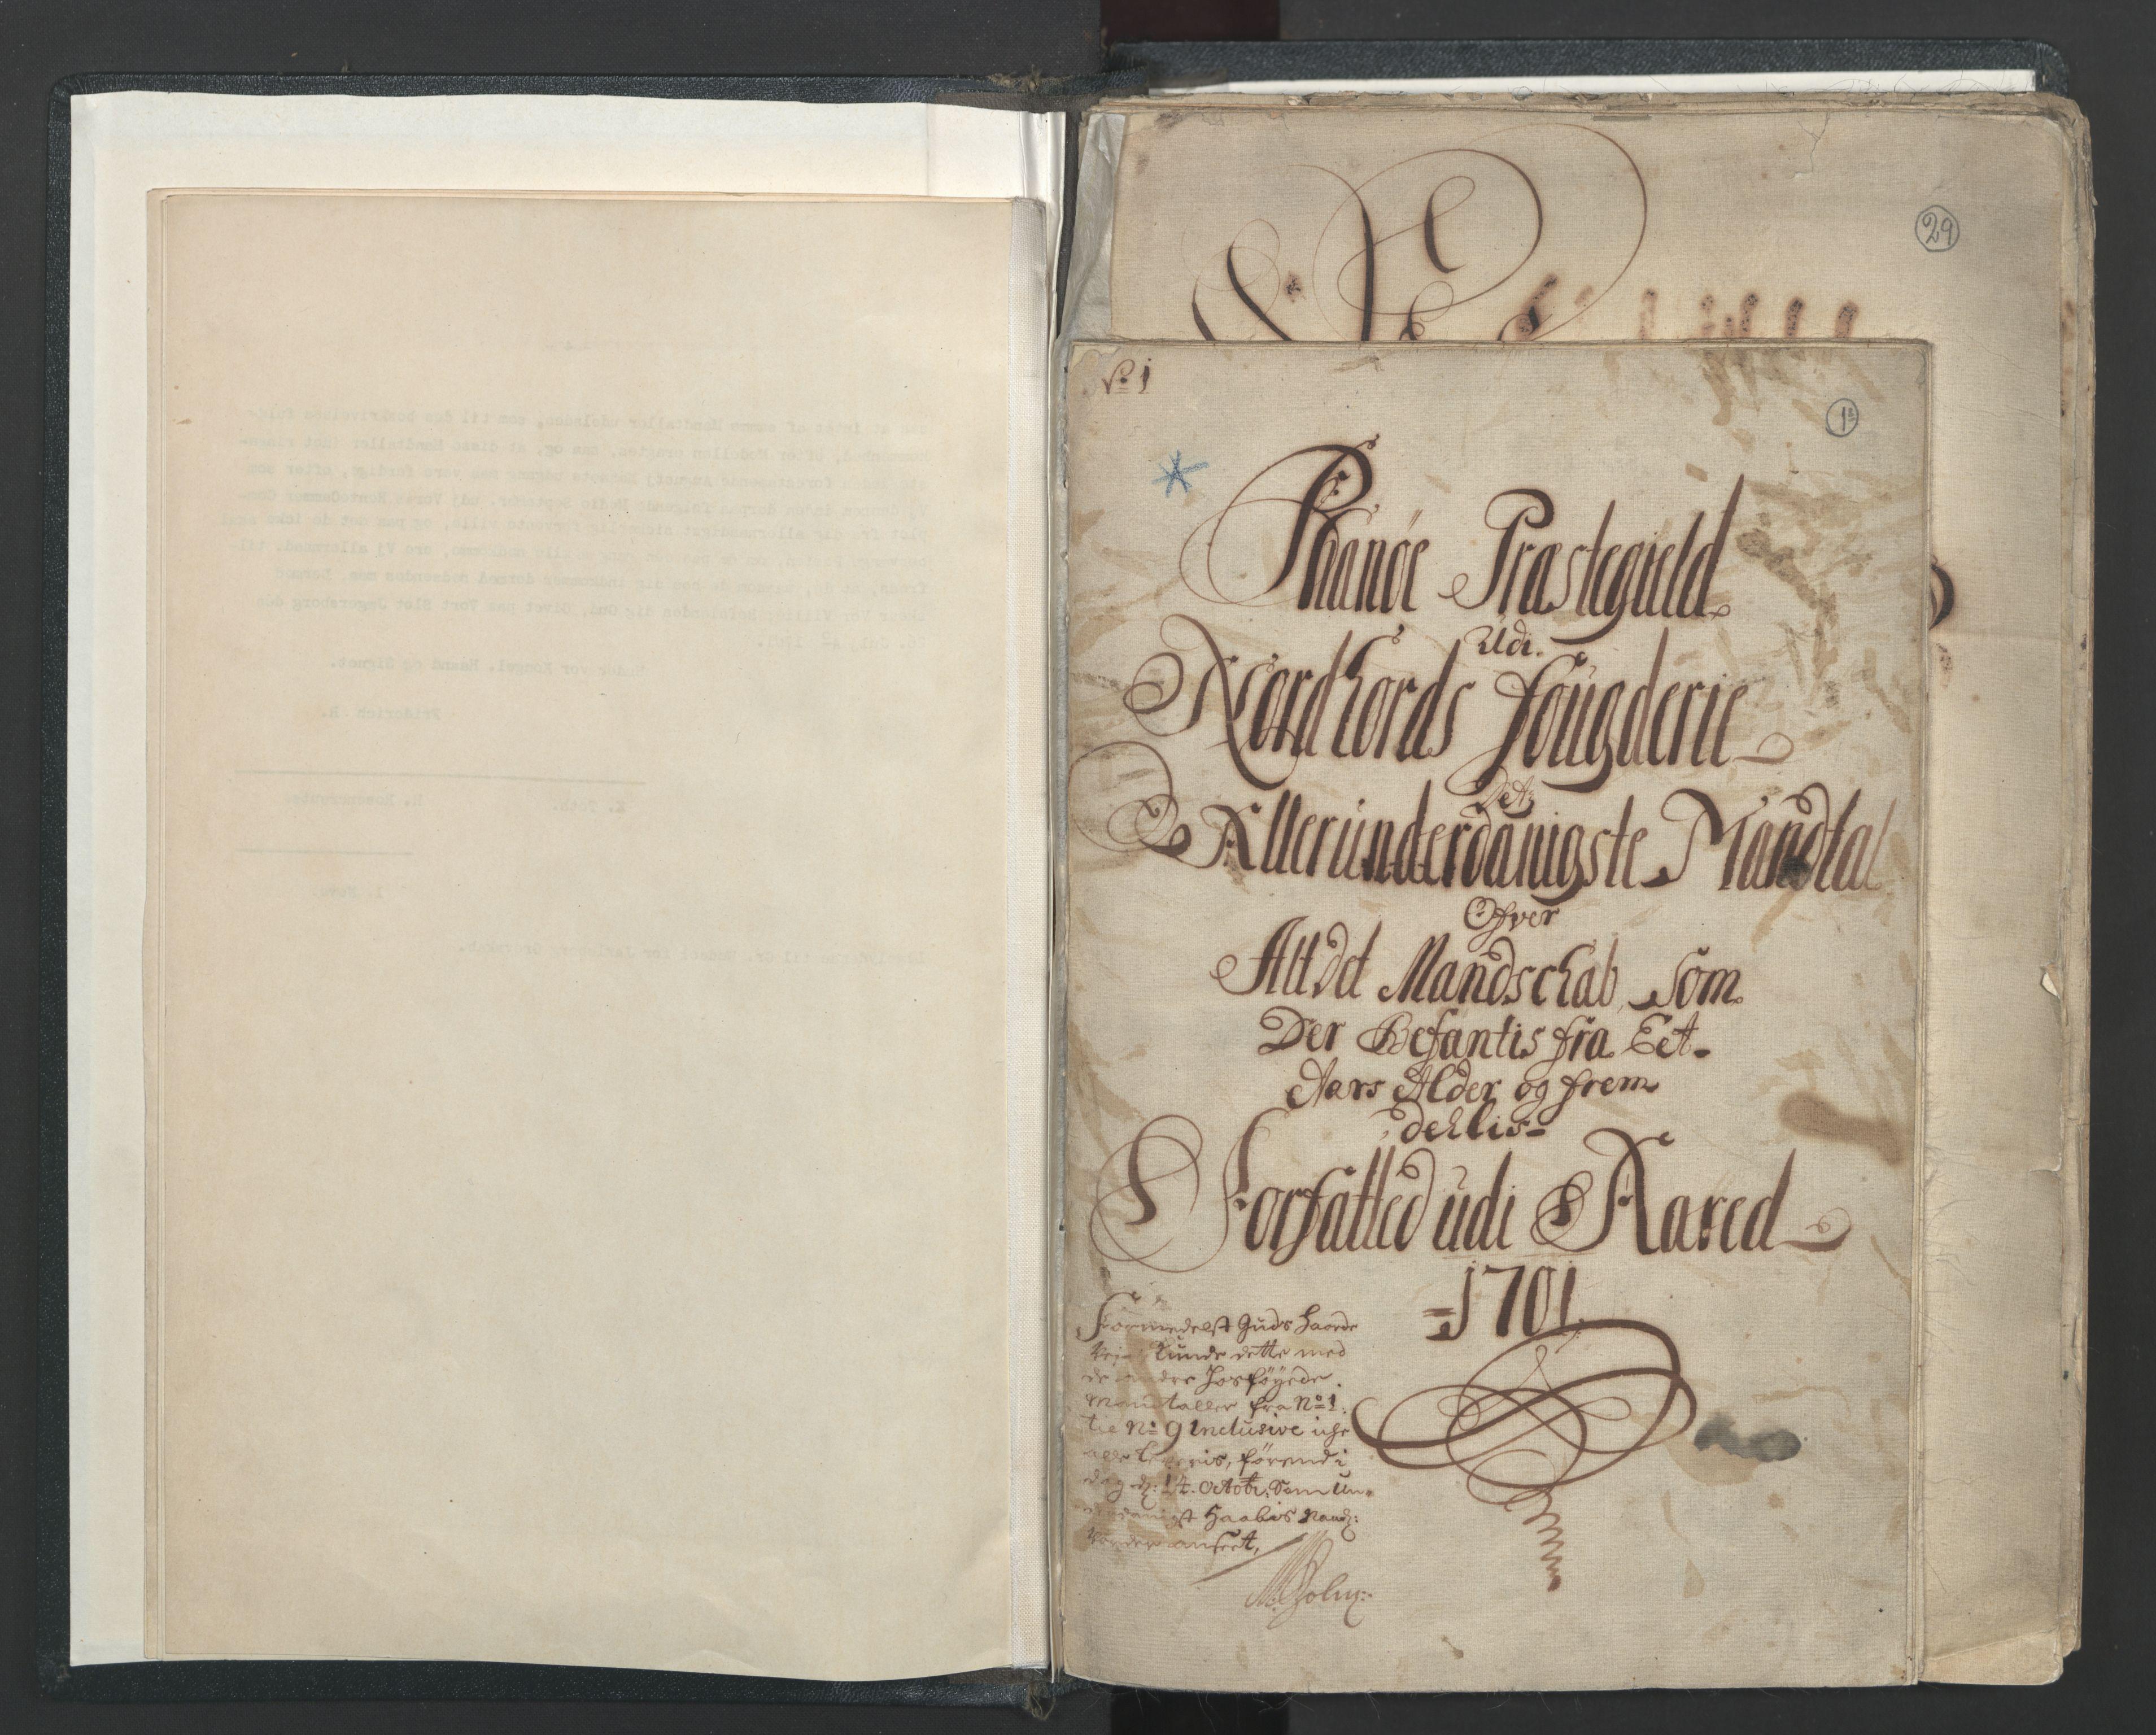 RA, Manntallet 1701, nr. 7: Nordhordland og Voss fogderi, 1701, s. 1